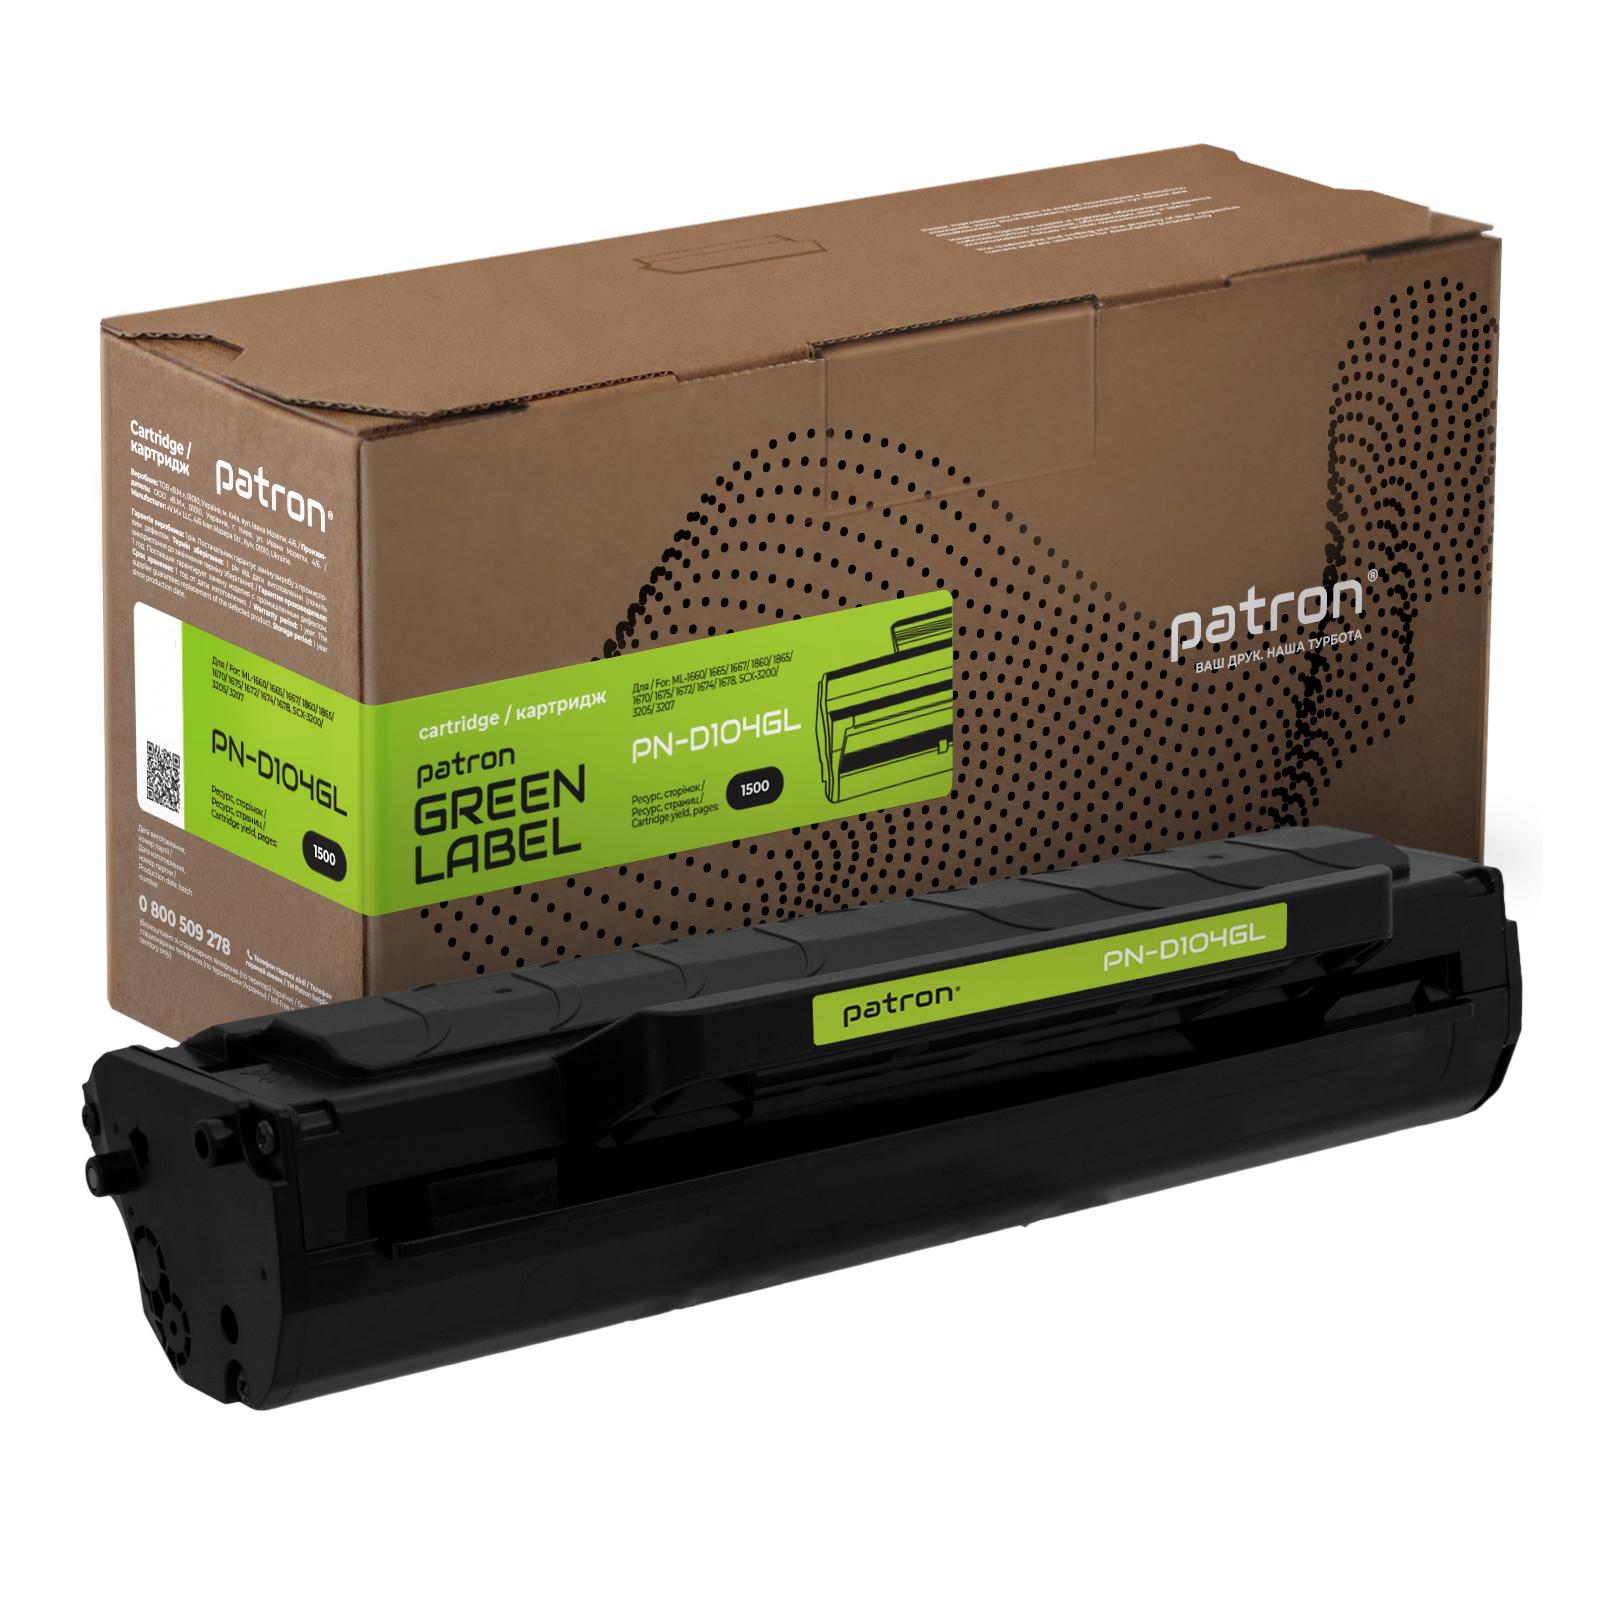 Картридж Patron SAMSUNG MLT-D104S GREEN Label (PN-D104GL)